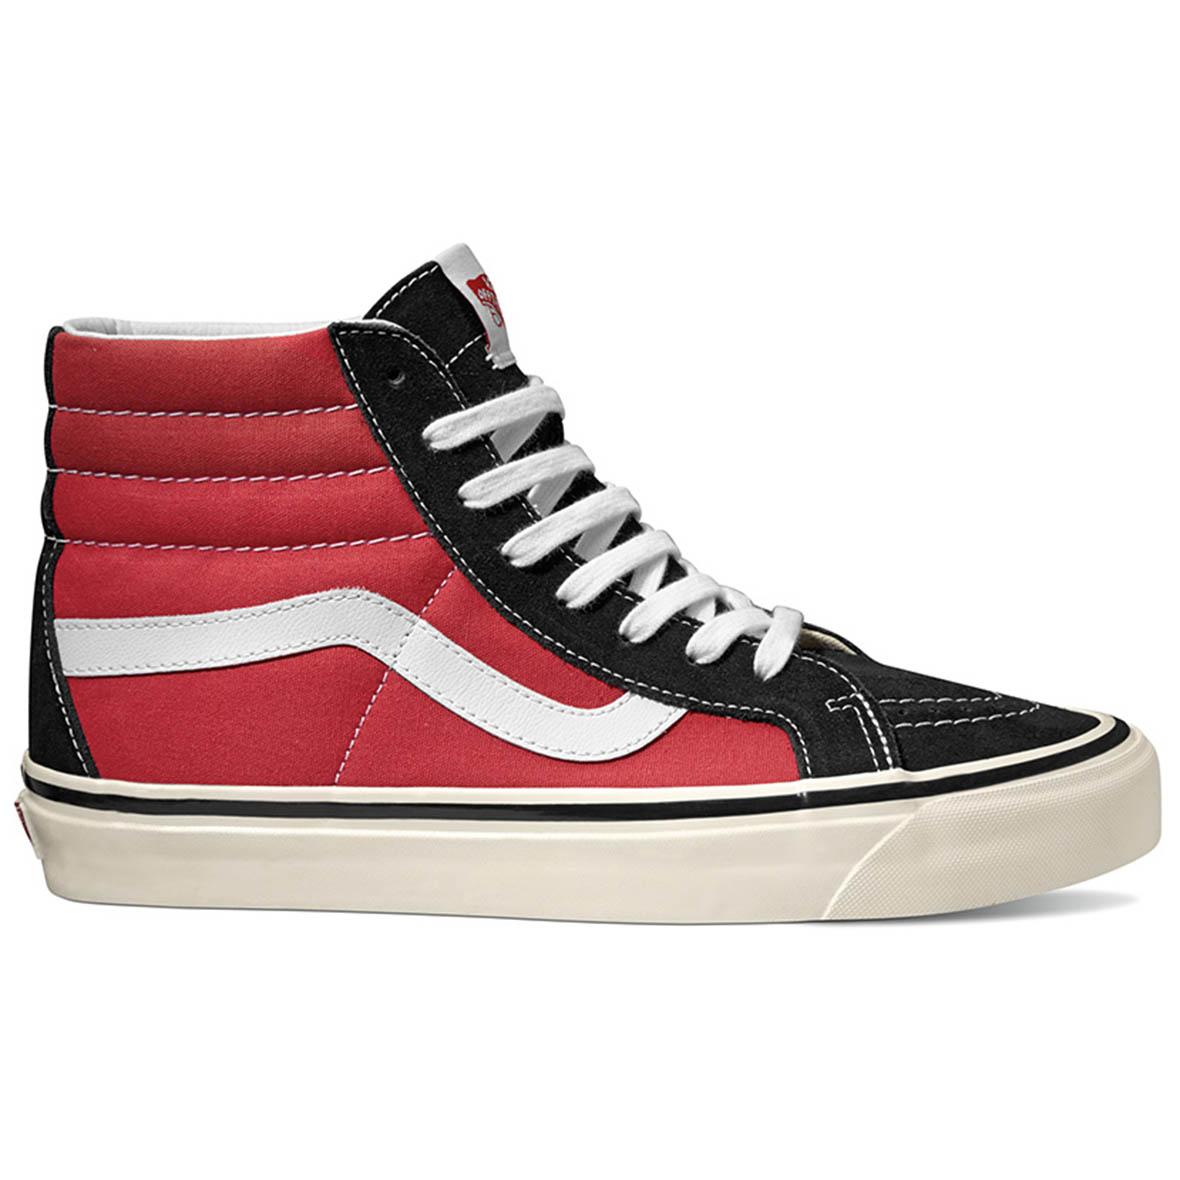 1545f87bf9a8 Vans Men s Anaheim Factory Sk8-Hi 38 DX Shoe